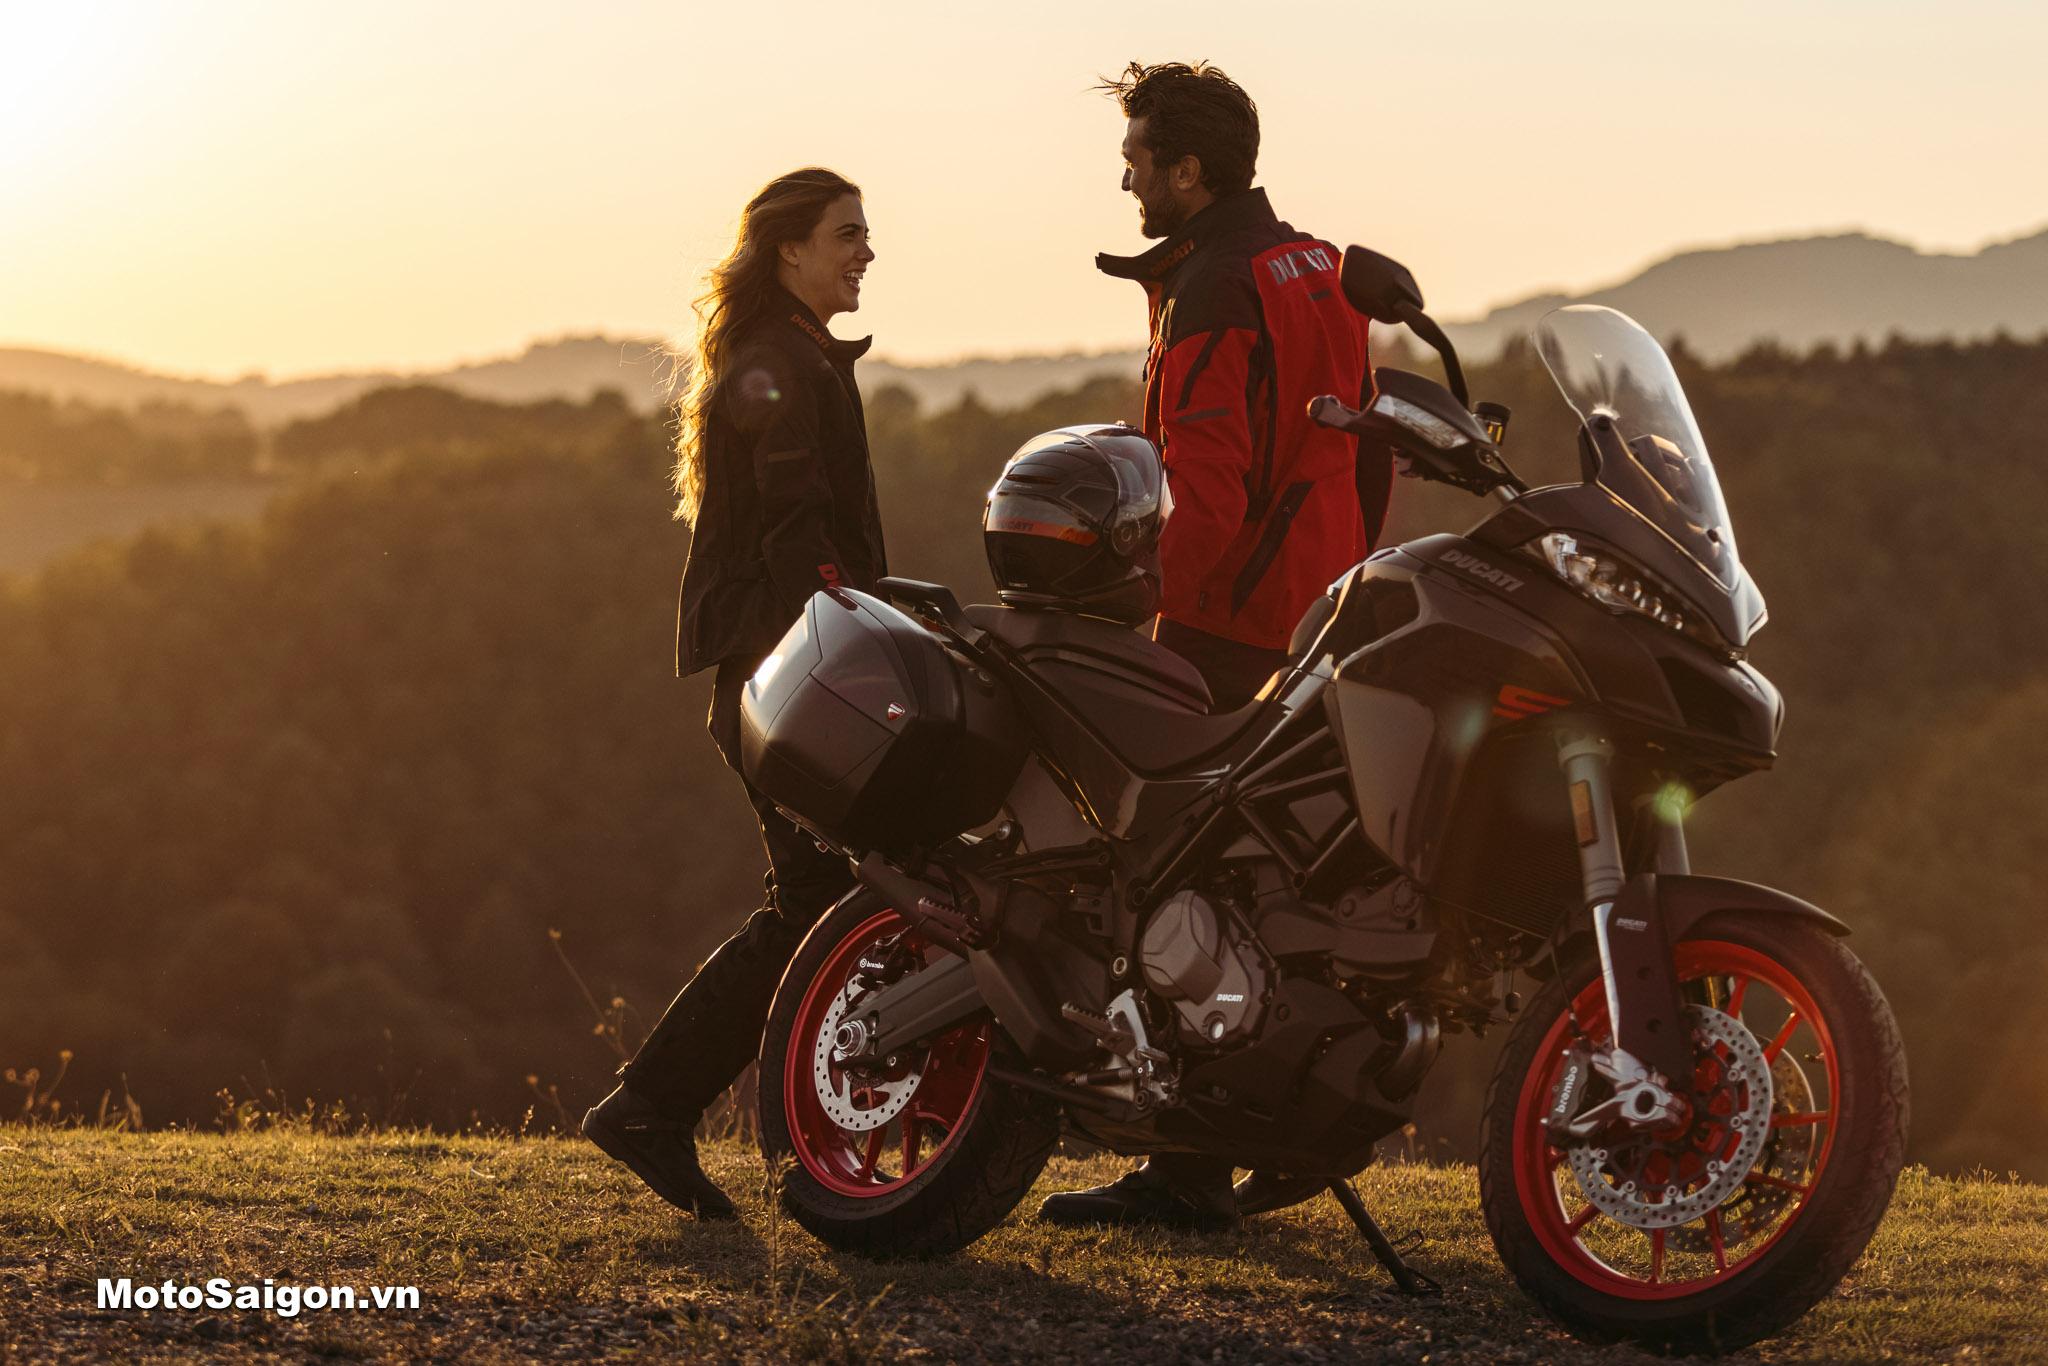 Ducati Multistrada V2 V2S đàn em của Multistrada V4 chính thức ra mắt